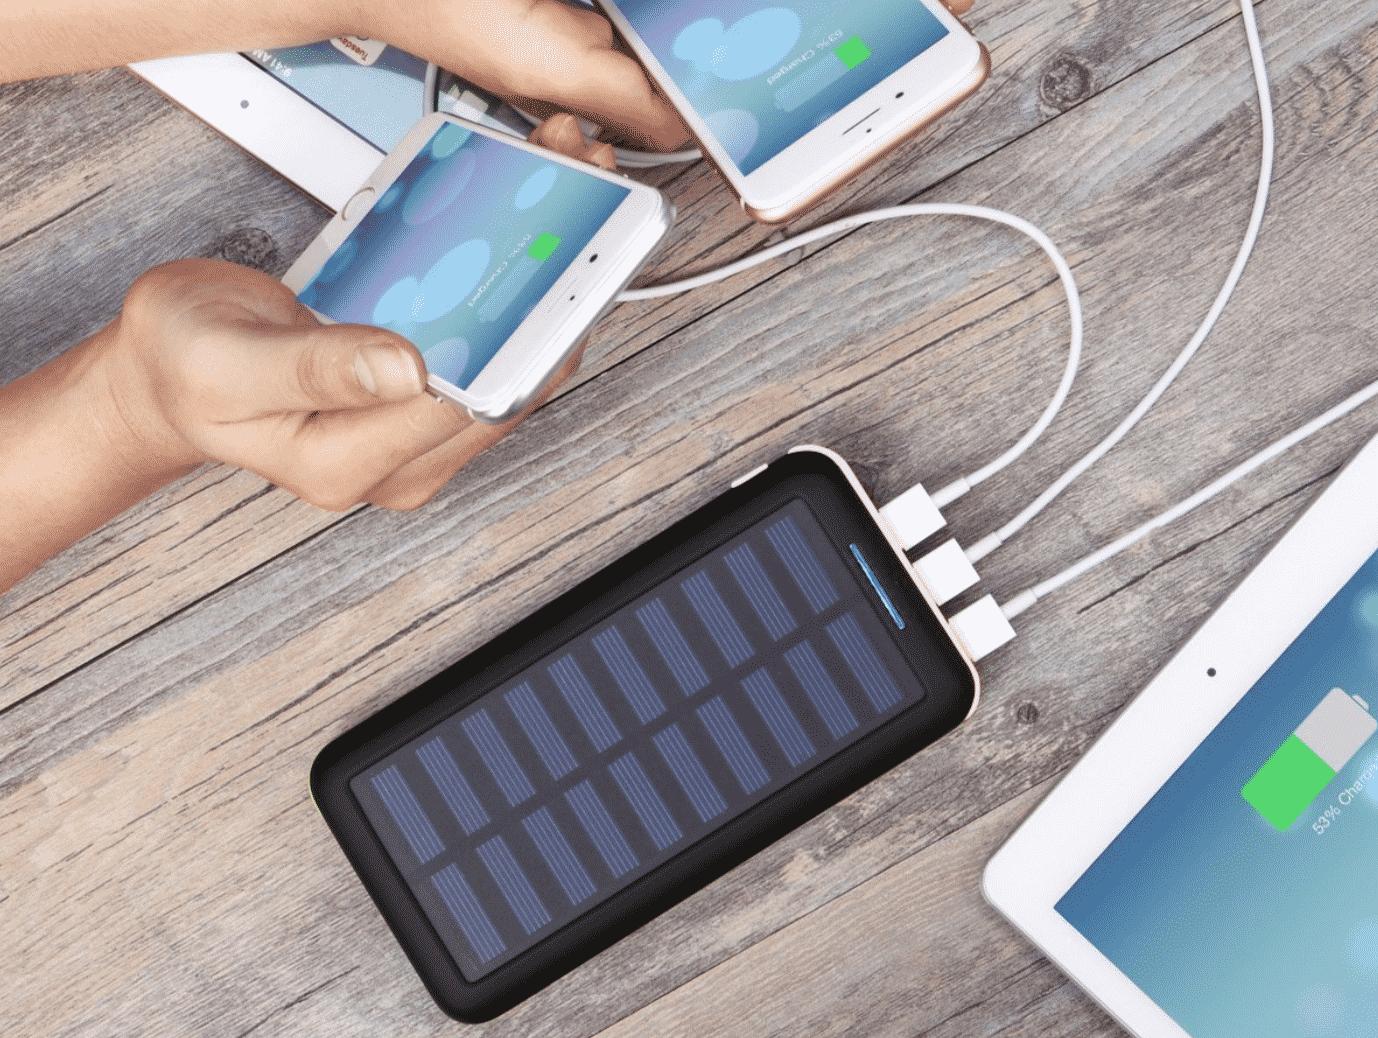 The 9 Best Renewable Energy Gadgets